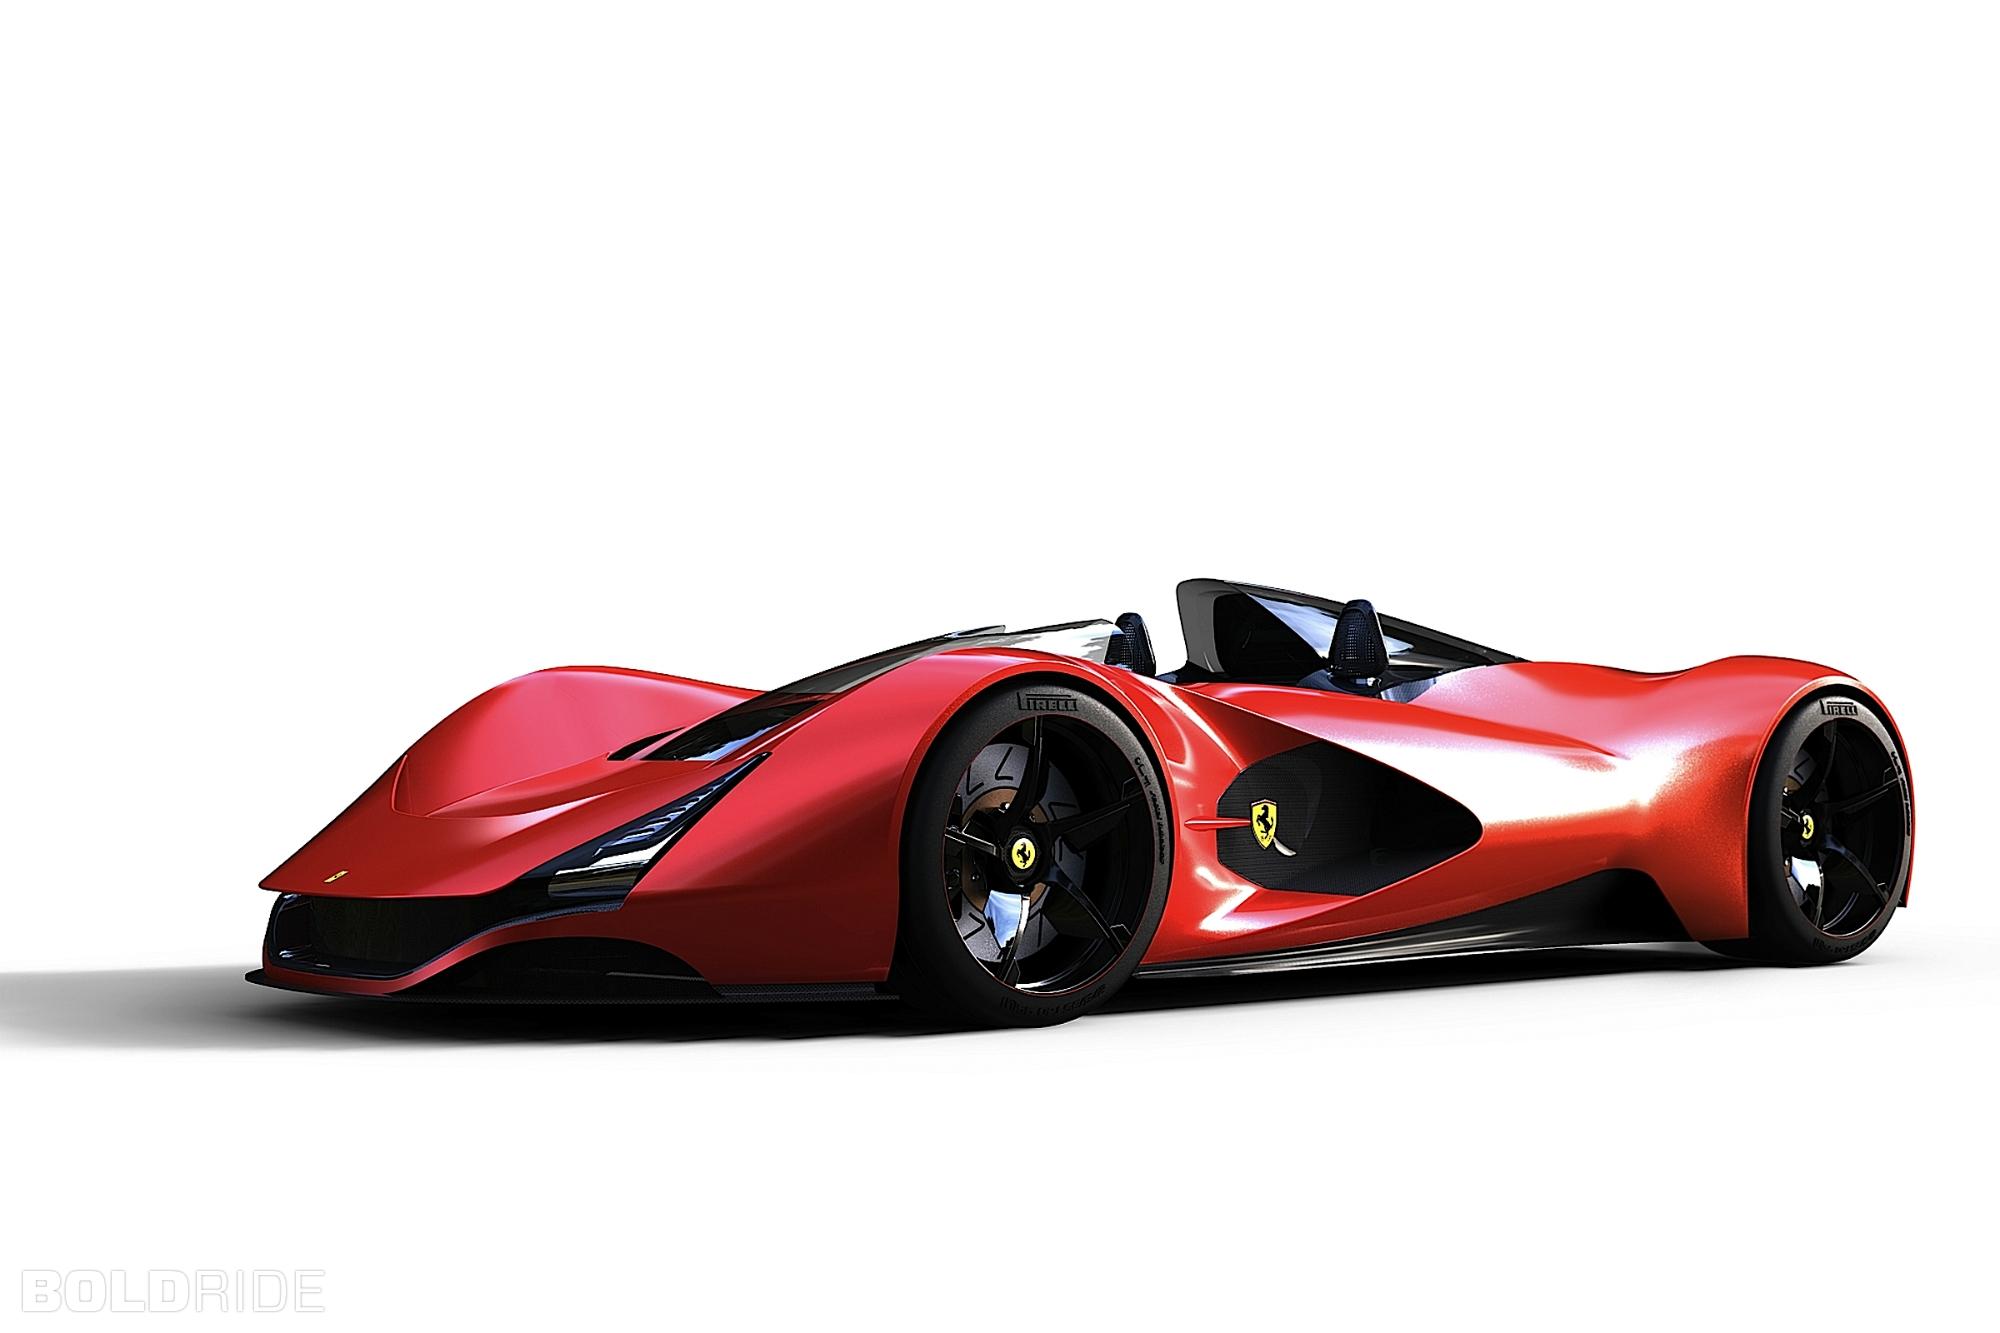 2011 Ferrari Aliante Concept supercar supercars wallpaper 2000x1333 2000x1333